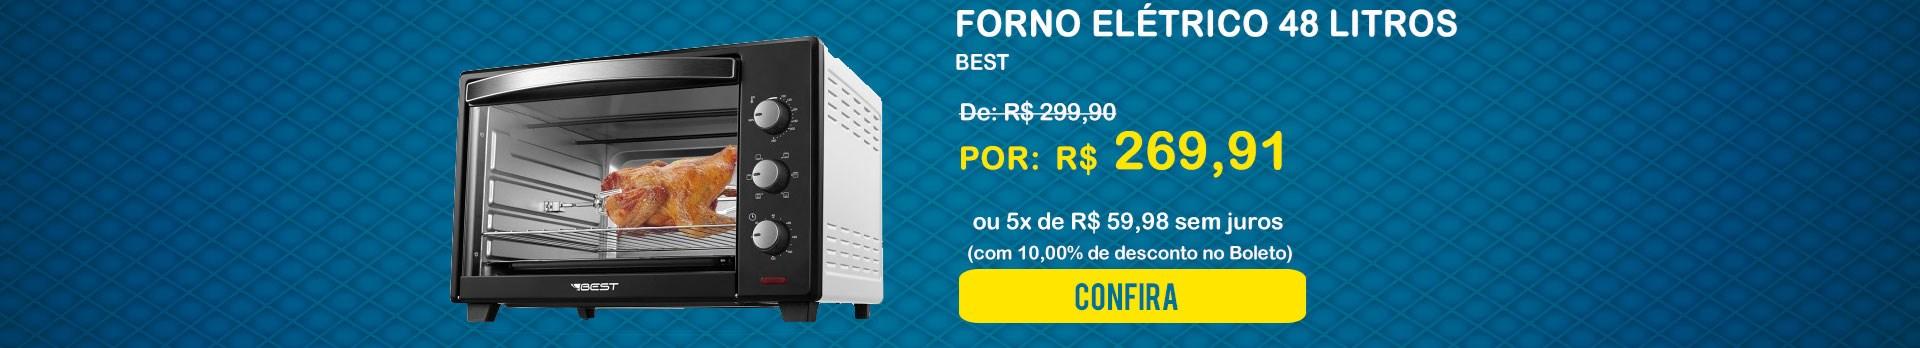 Forno Elétrico 48 Litros - Best